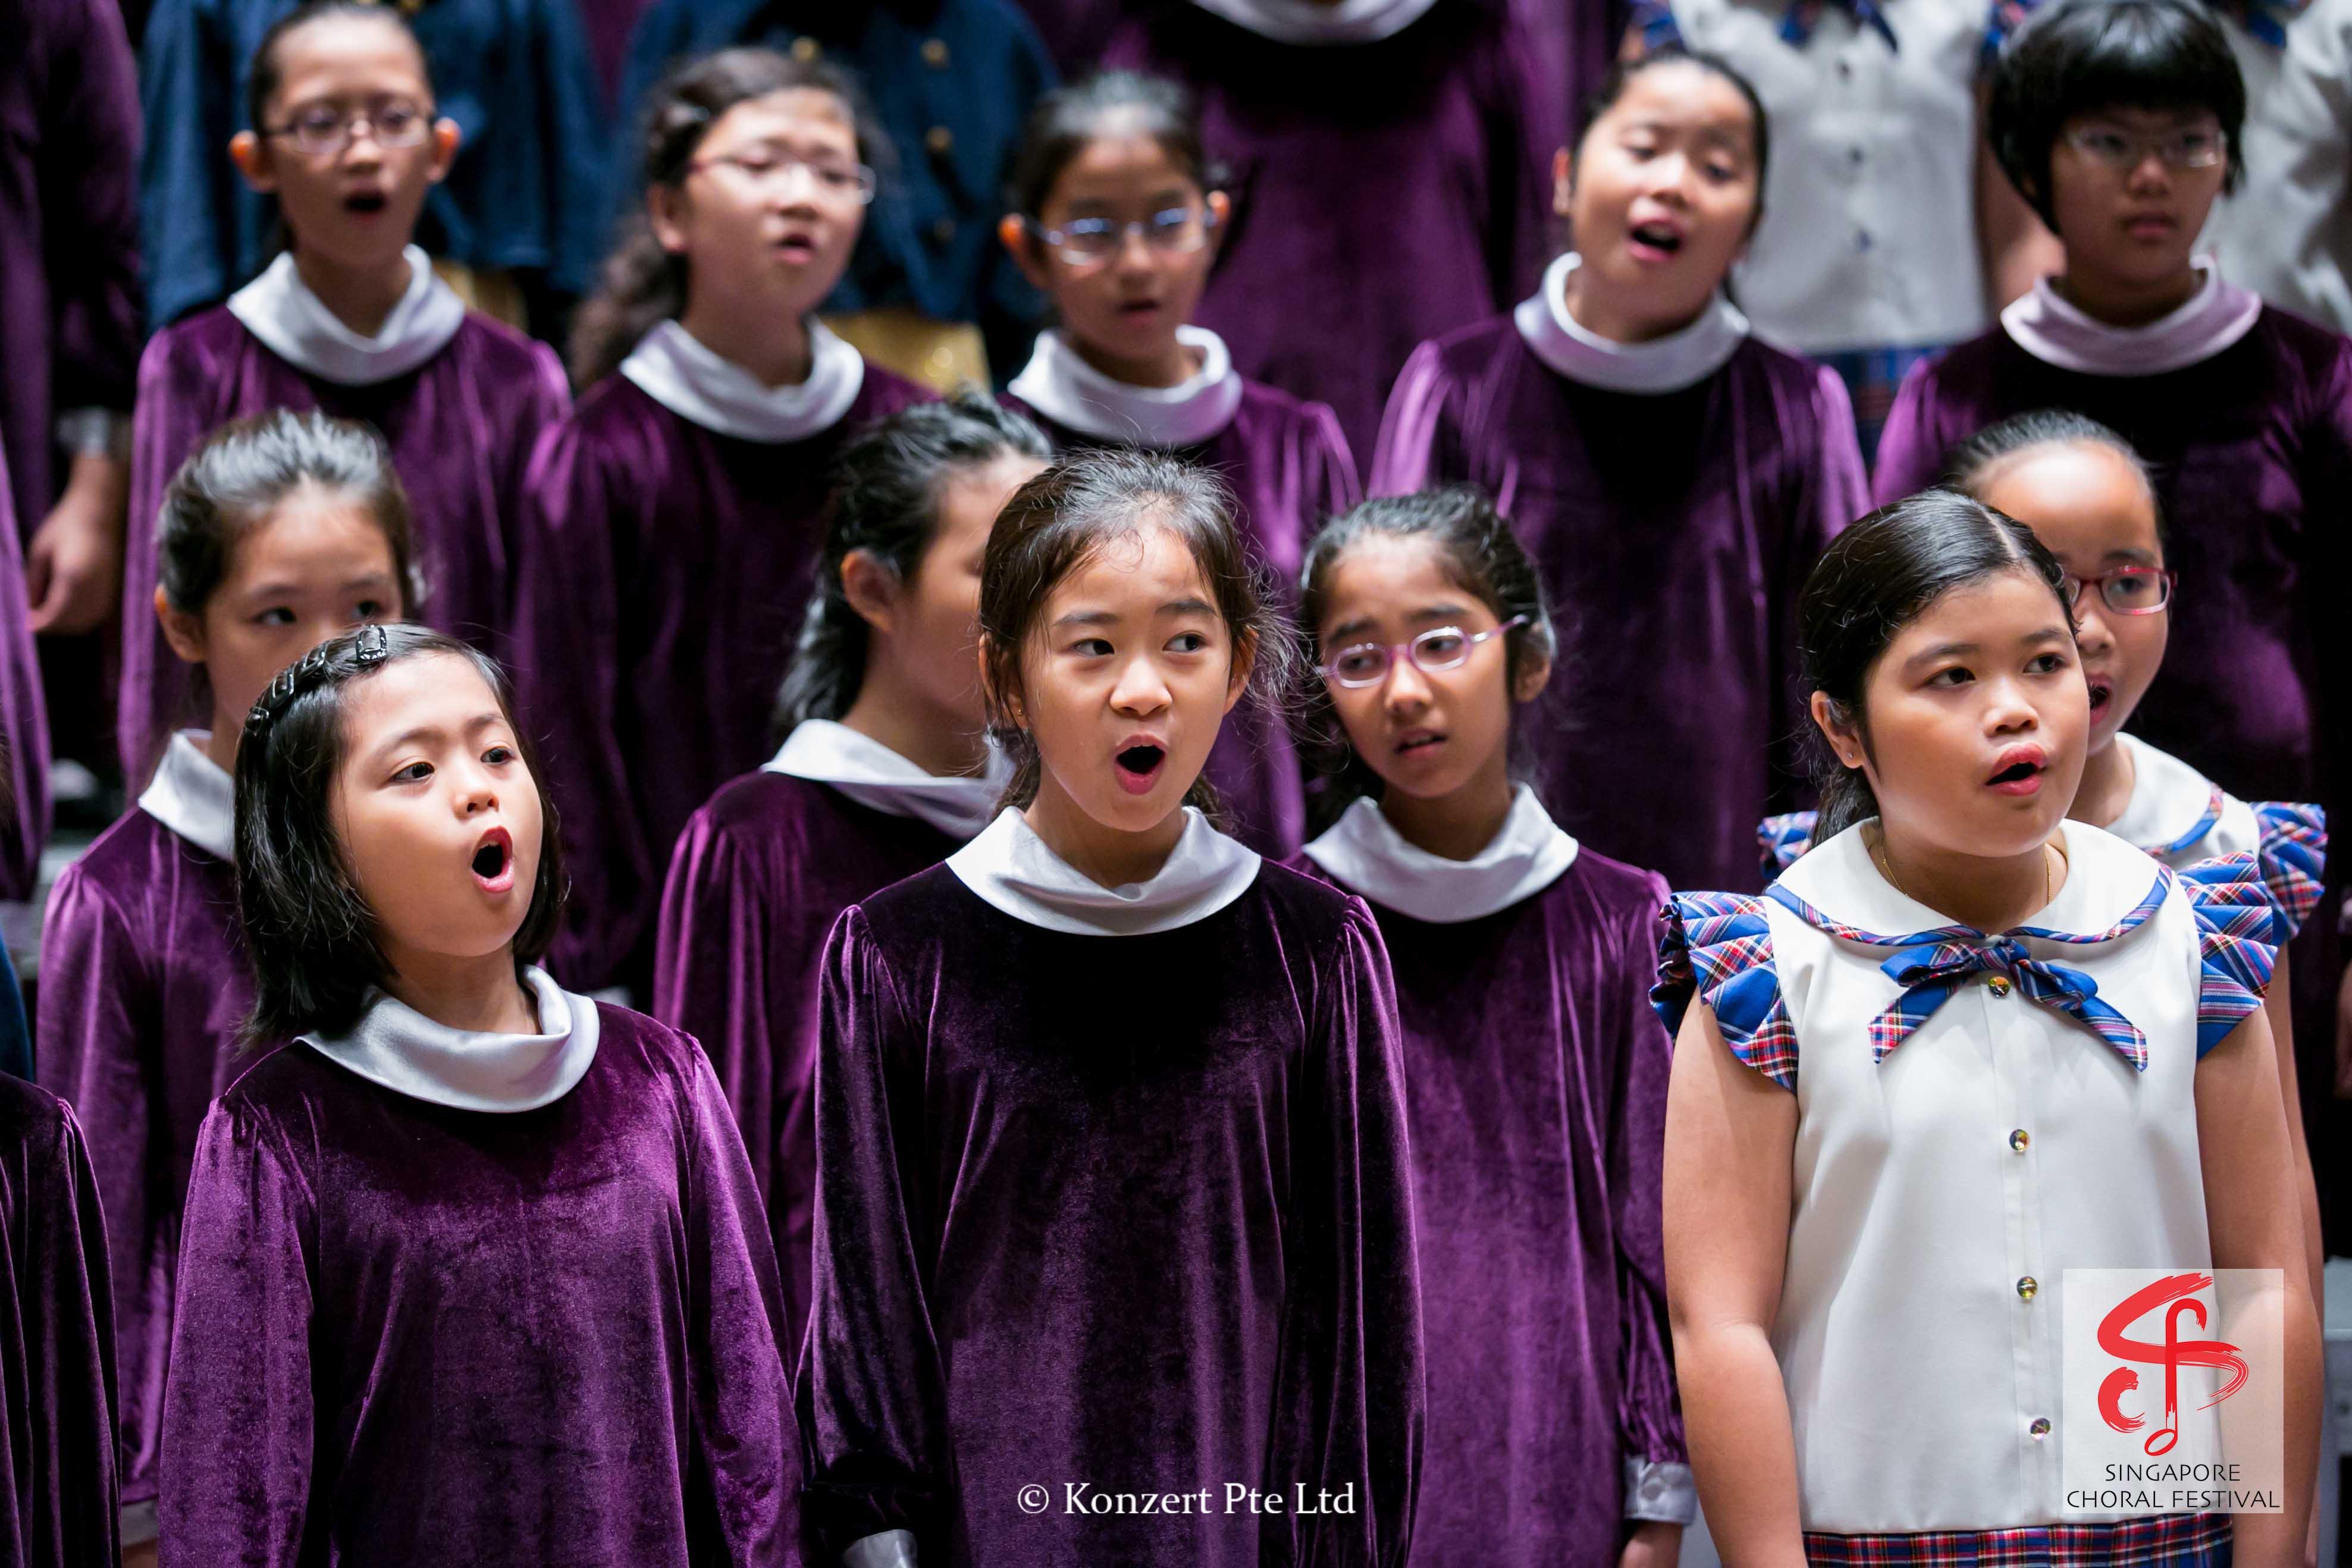 Singapore Choral Festival 8-8-15 (3).jpg